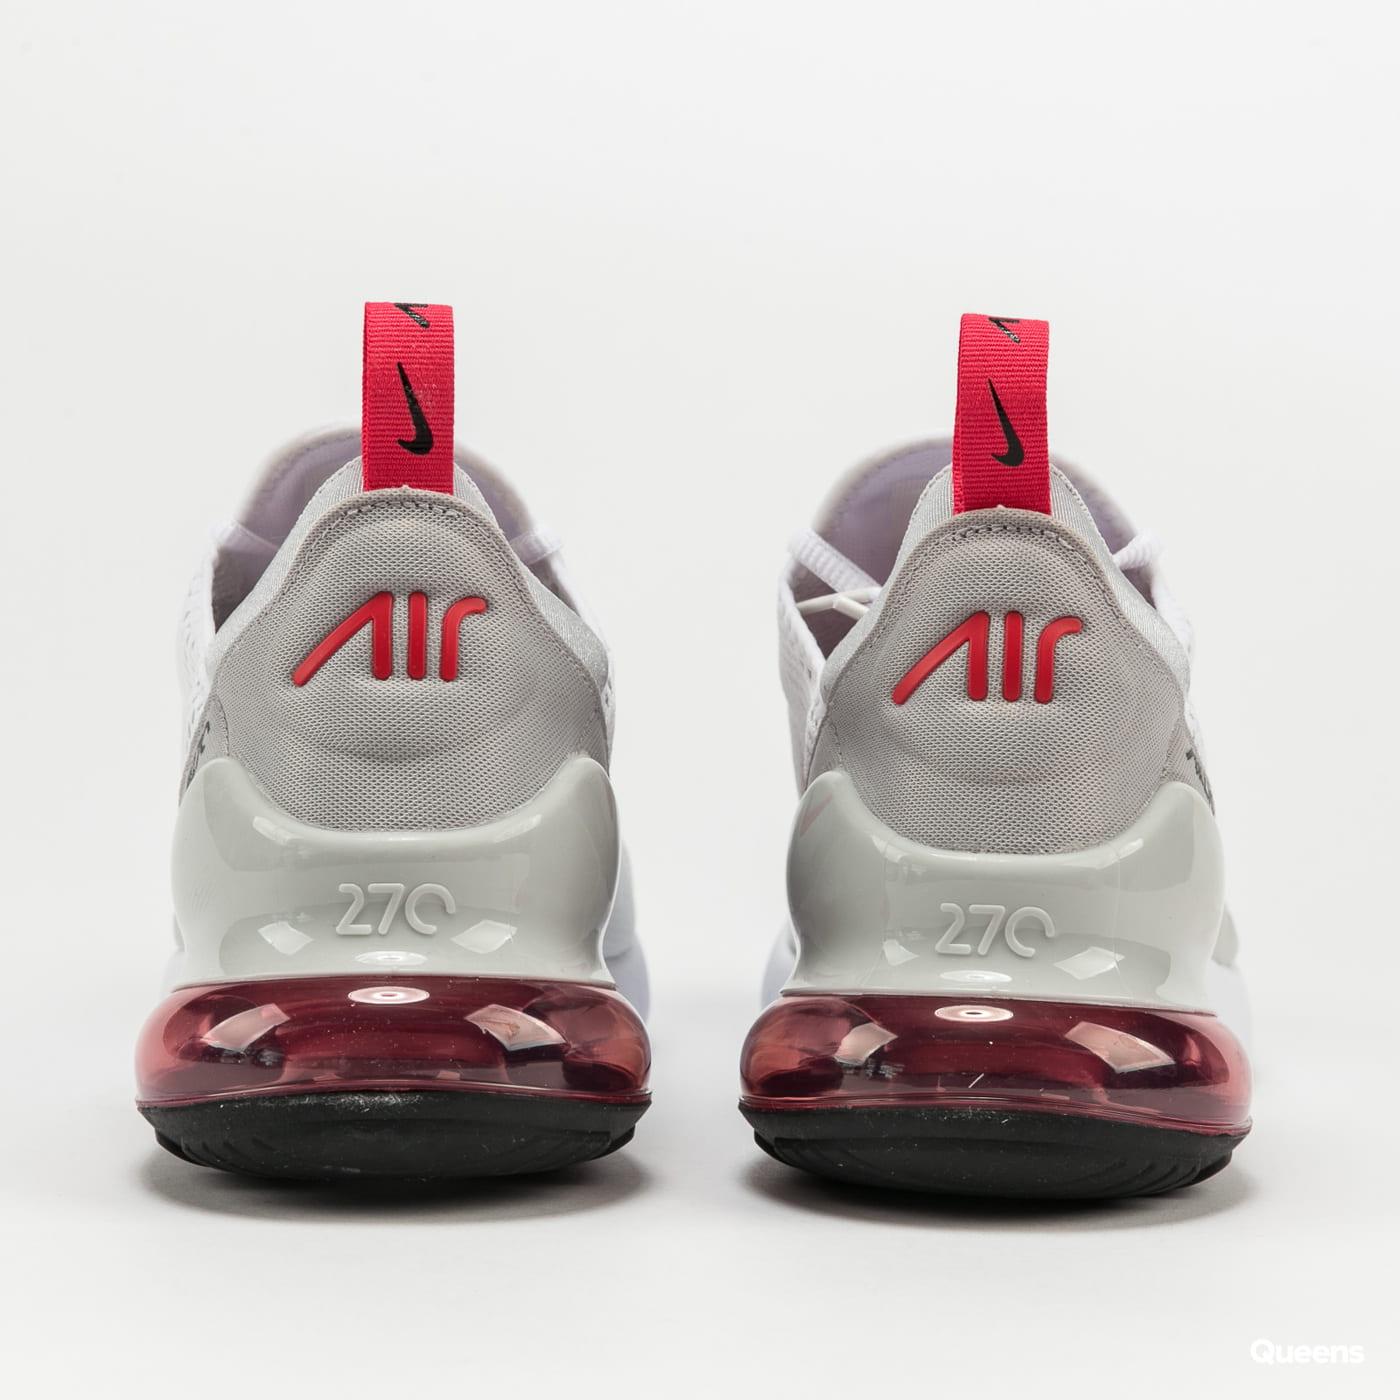 Nike Air Max 270 white / lt fusion red - grey fog